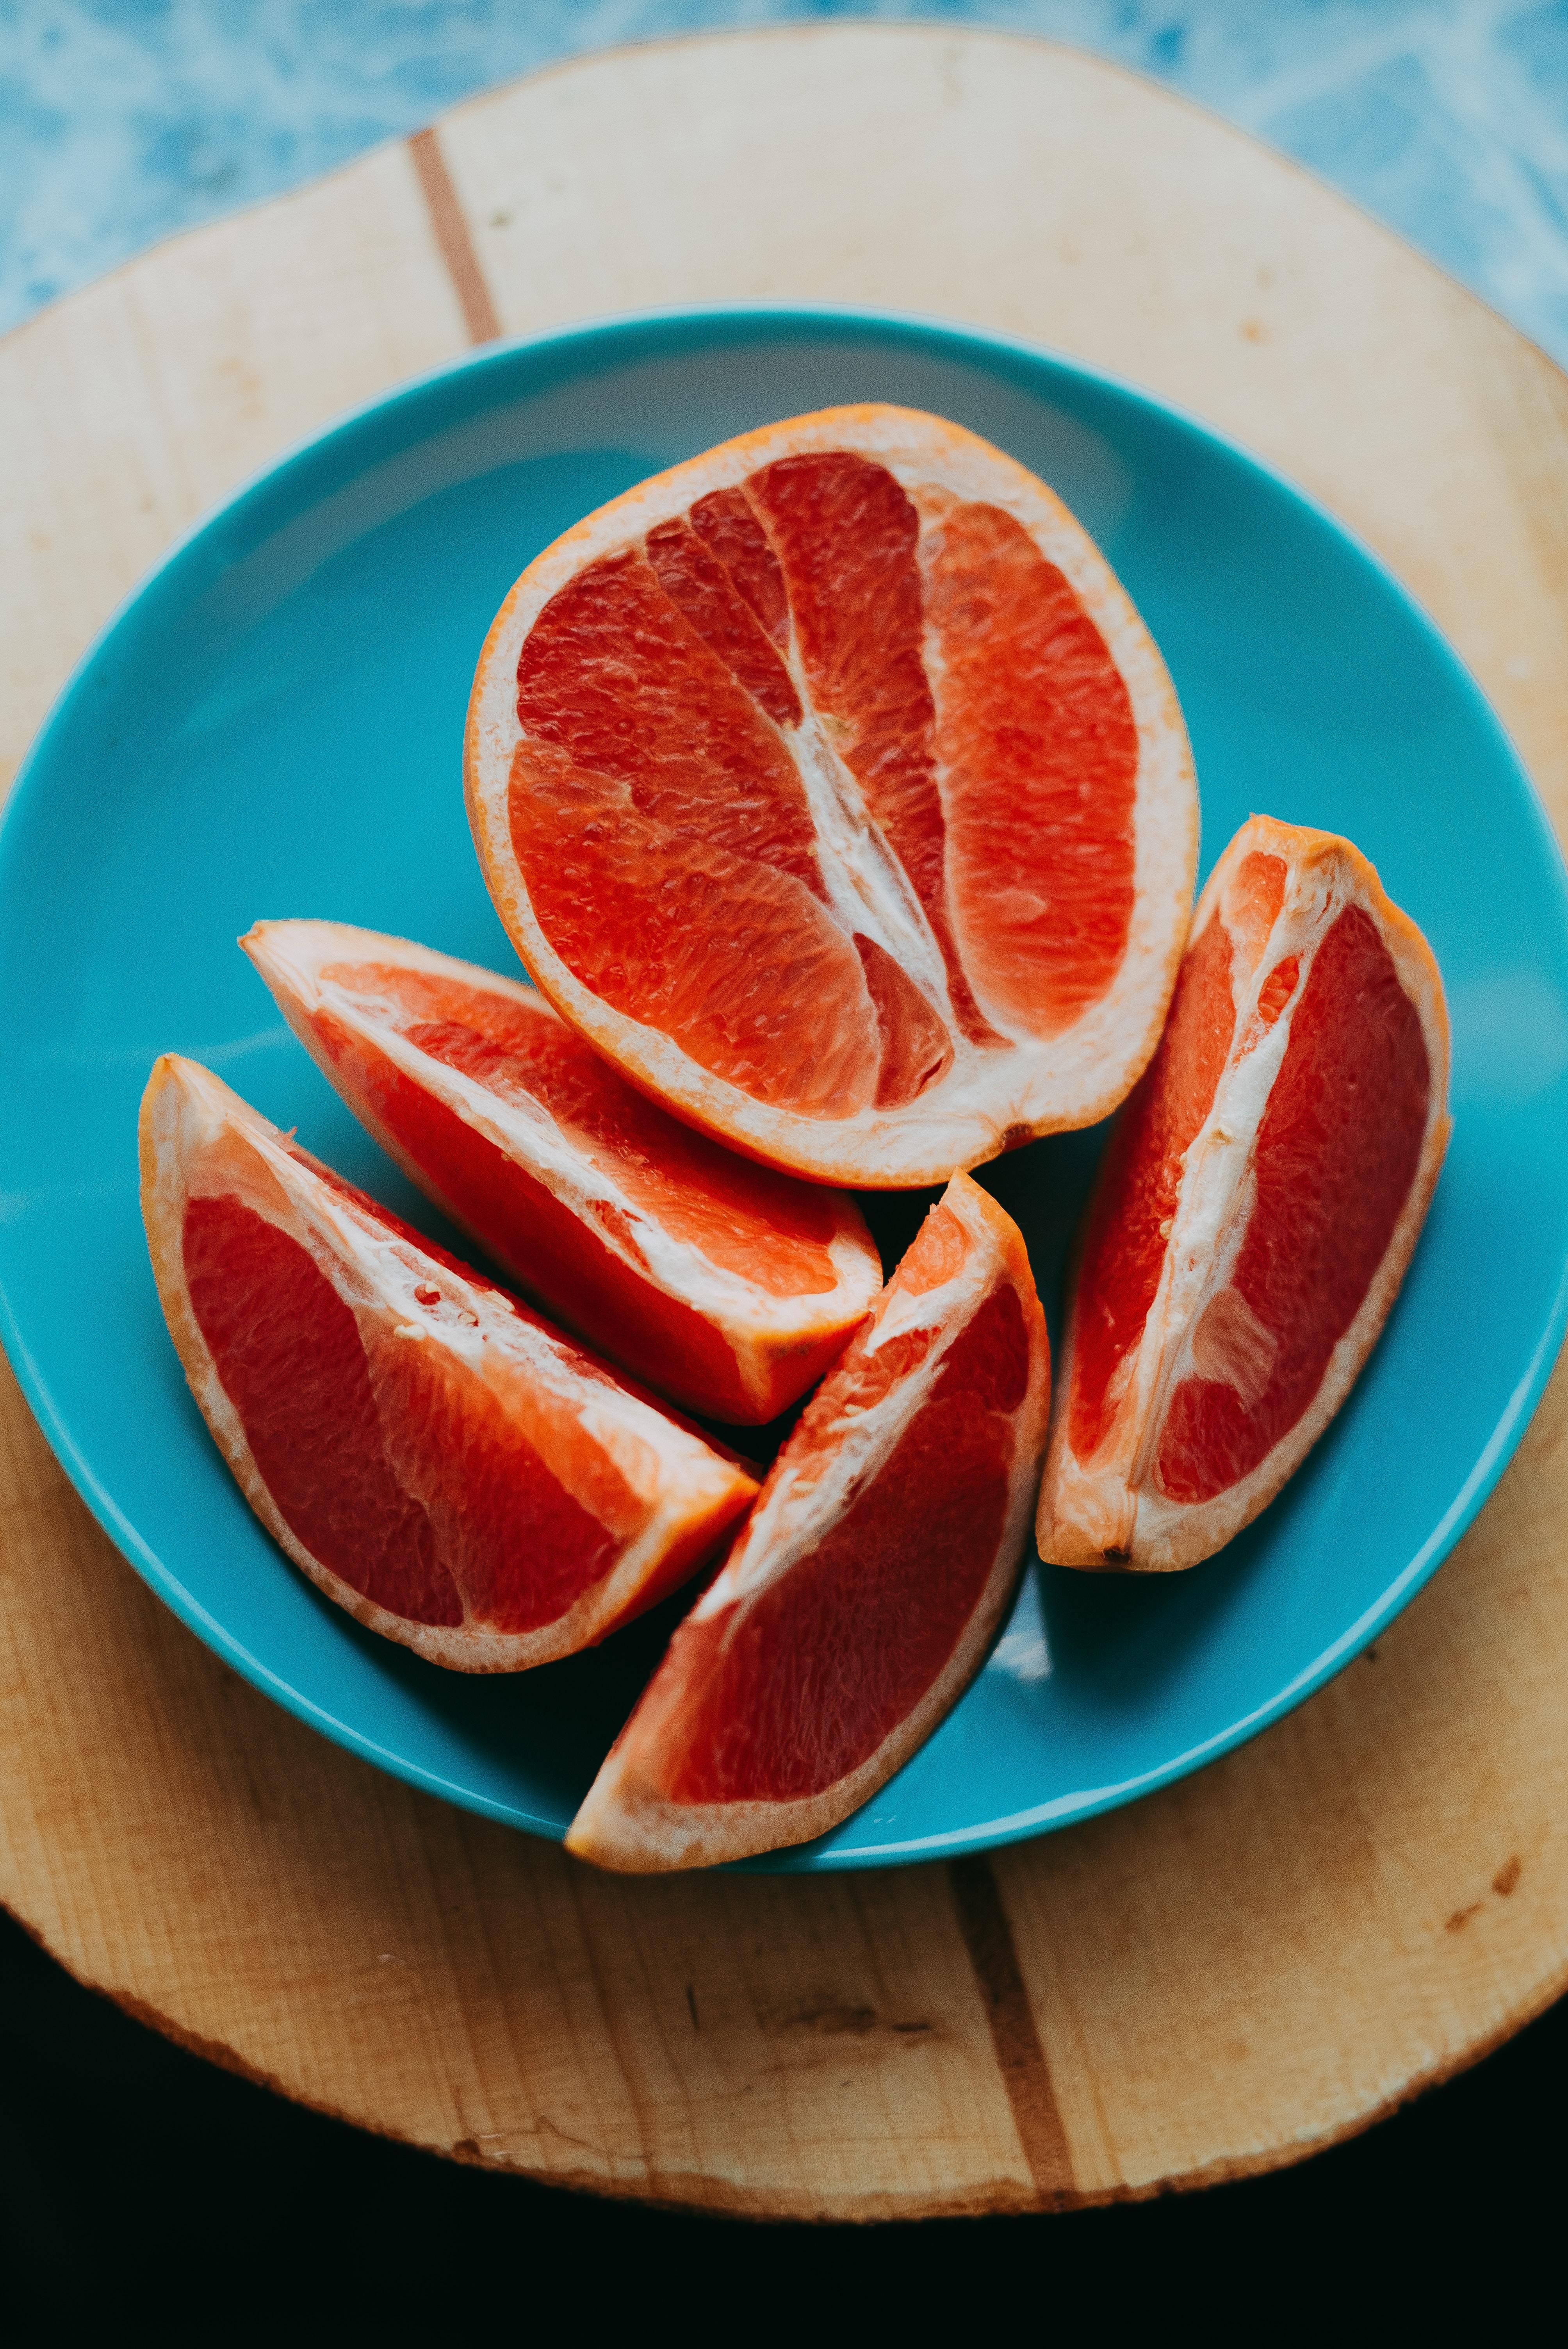 slice fruits on blue plate